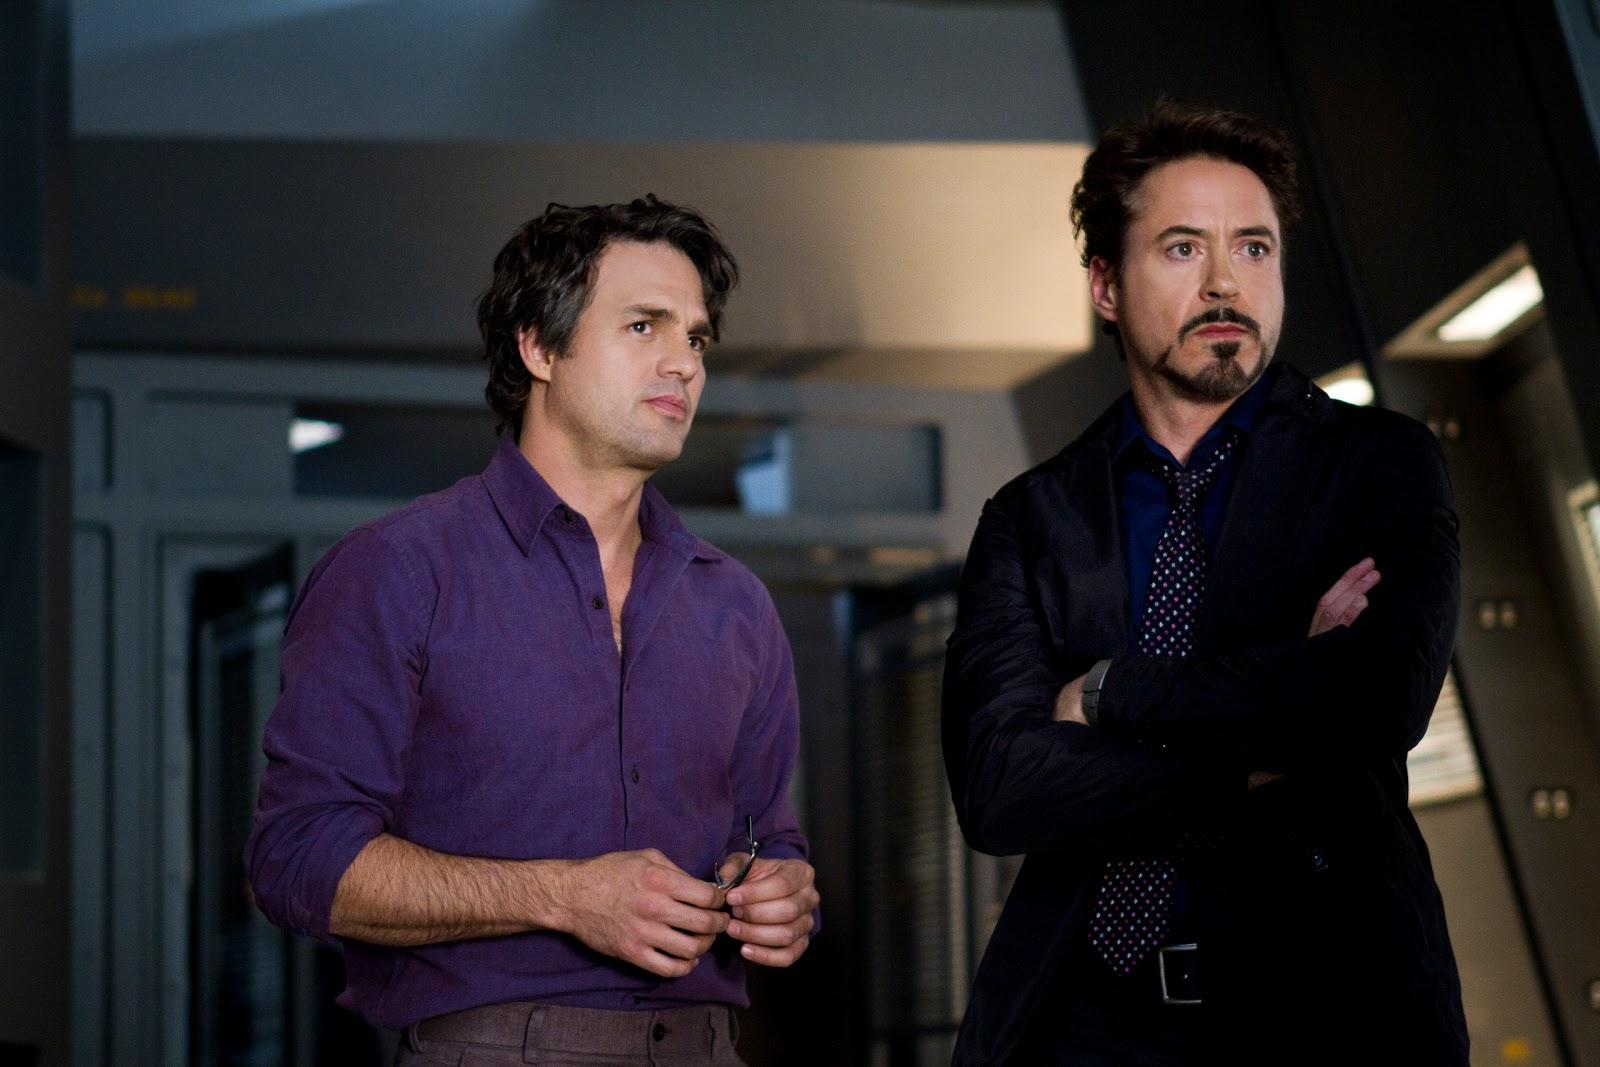 http://4.bp.blogspot.com/-P3T0iSy4tQQ/TzBi2n6Ss7I/AAAAAAAAAtI/ud8QhiR-DT4/s1600/Avengers.+Mark+Ruffalo+and+Robert+Downey+jr..jpg